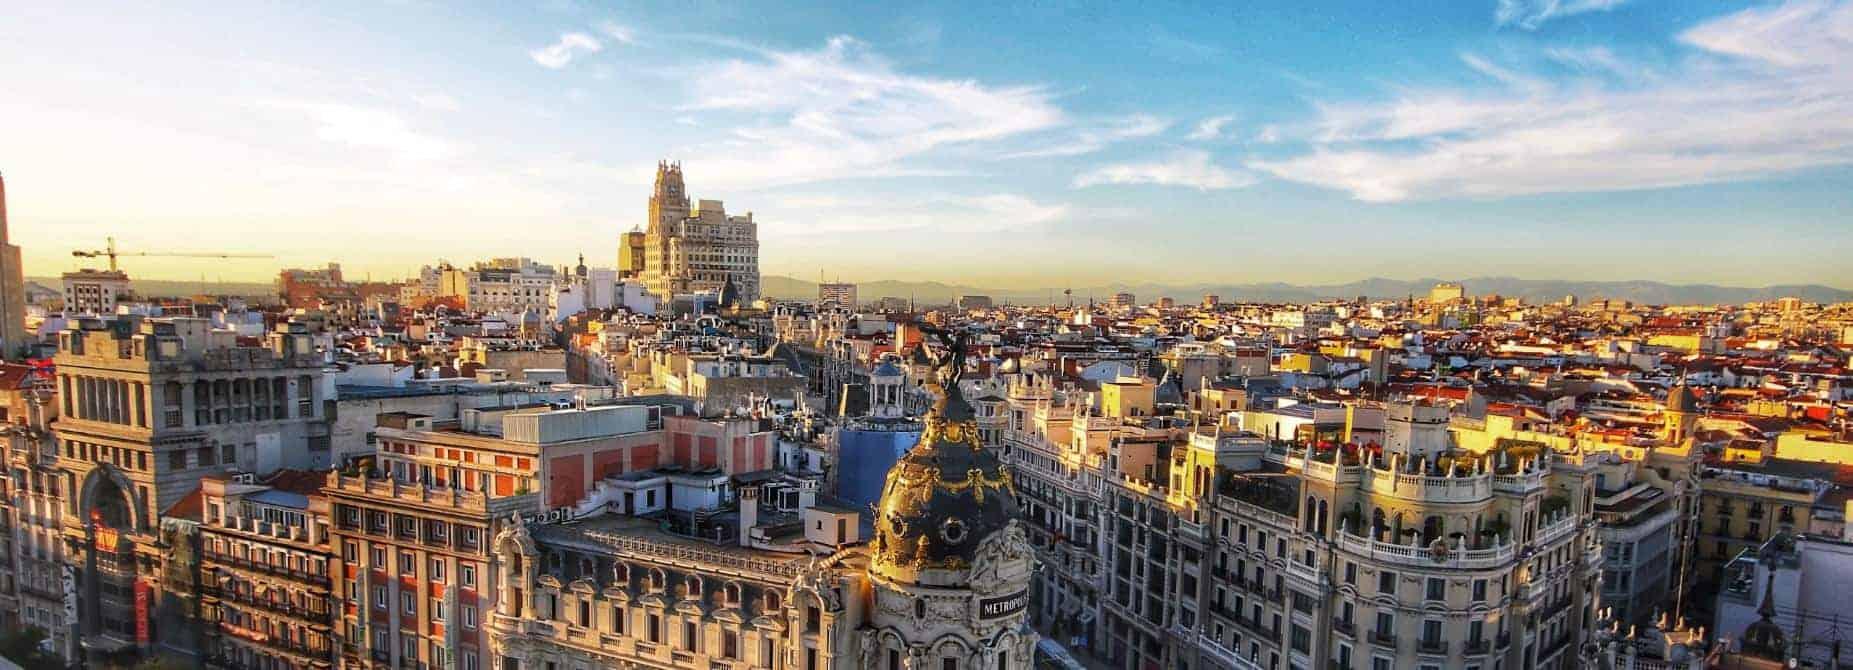 Immobilien Investoren Käufer Spanien Madrid